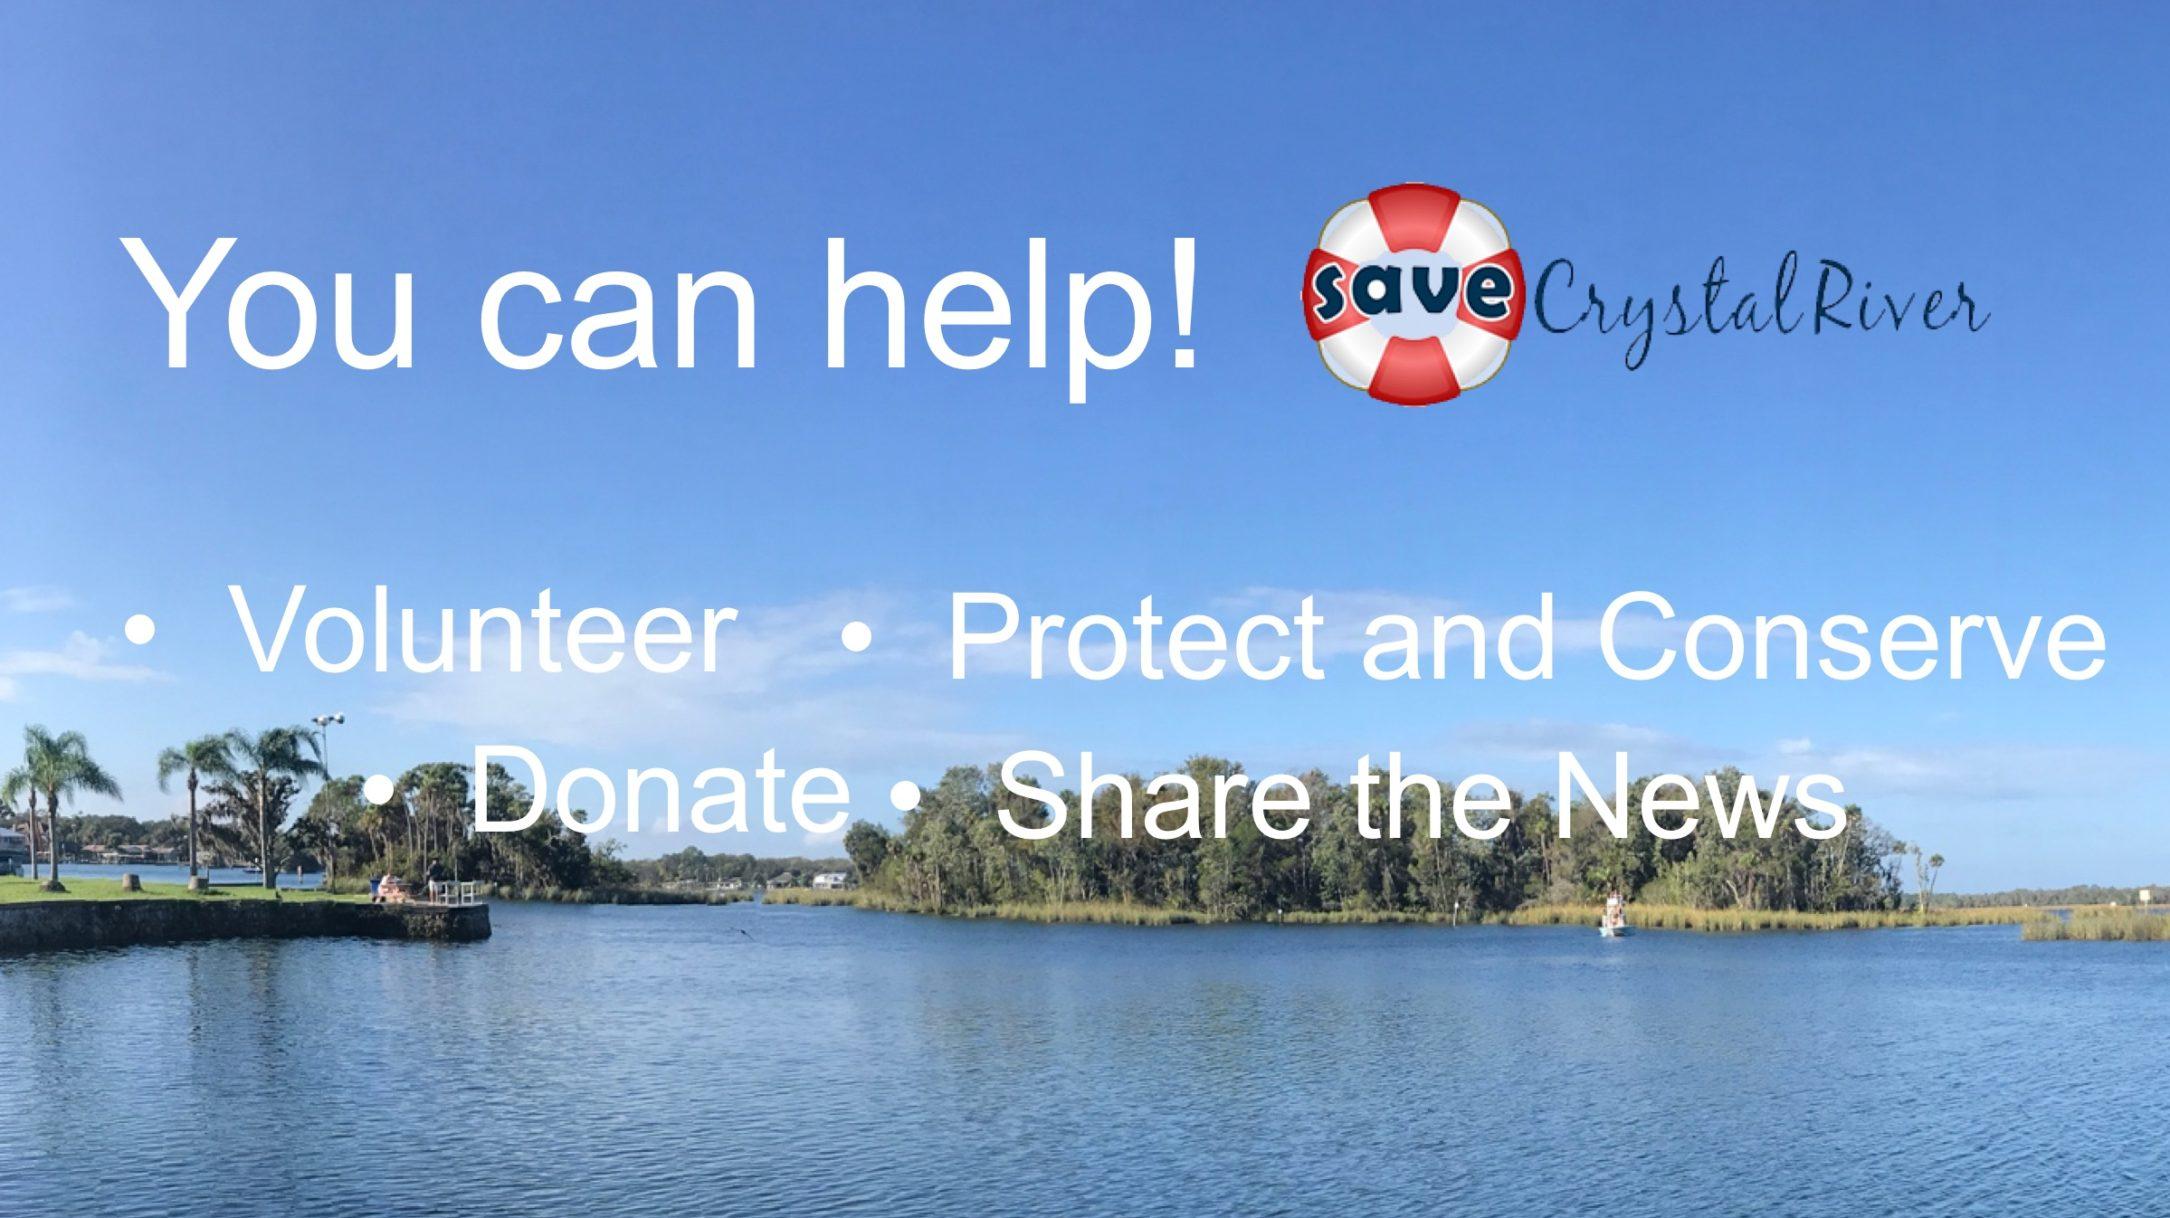 Save Crystal River Kings Bay